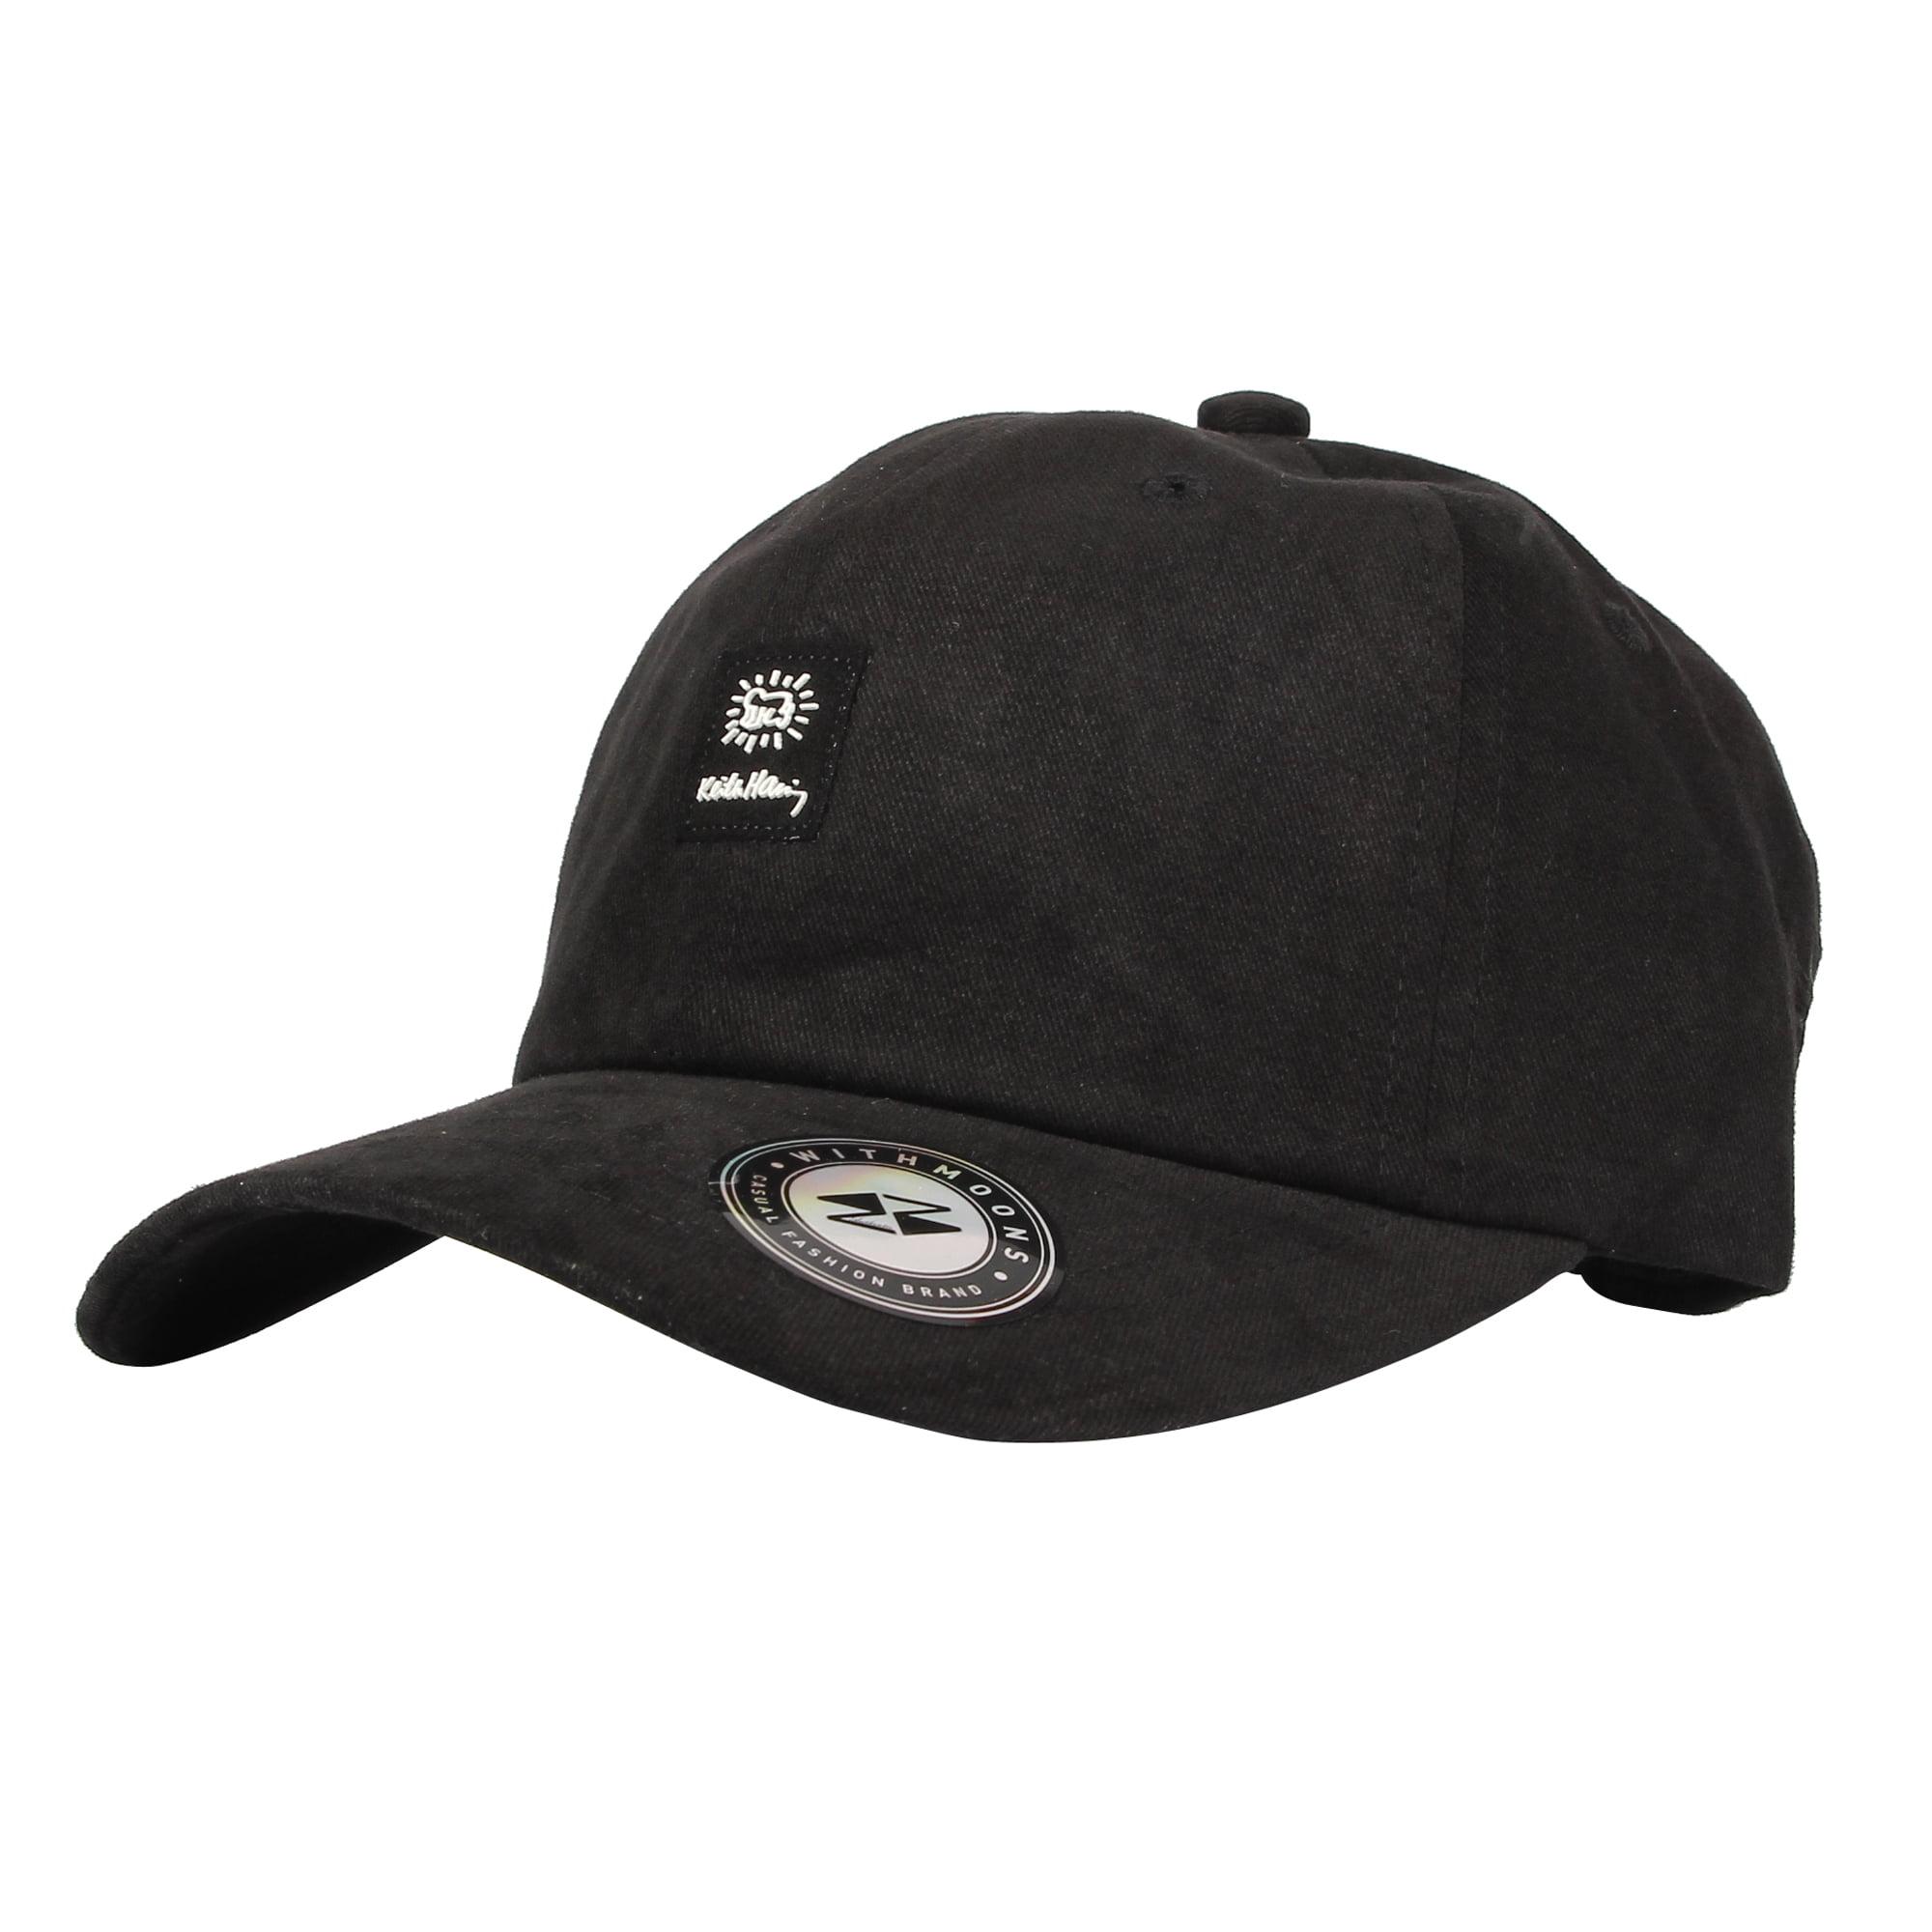 WITHMOONS Baseball Cap Simple Keith Haring Man Patch Hat CR11091 (Black)CR11091Black  - Walmart.com 7b43af97f96